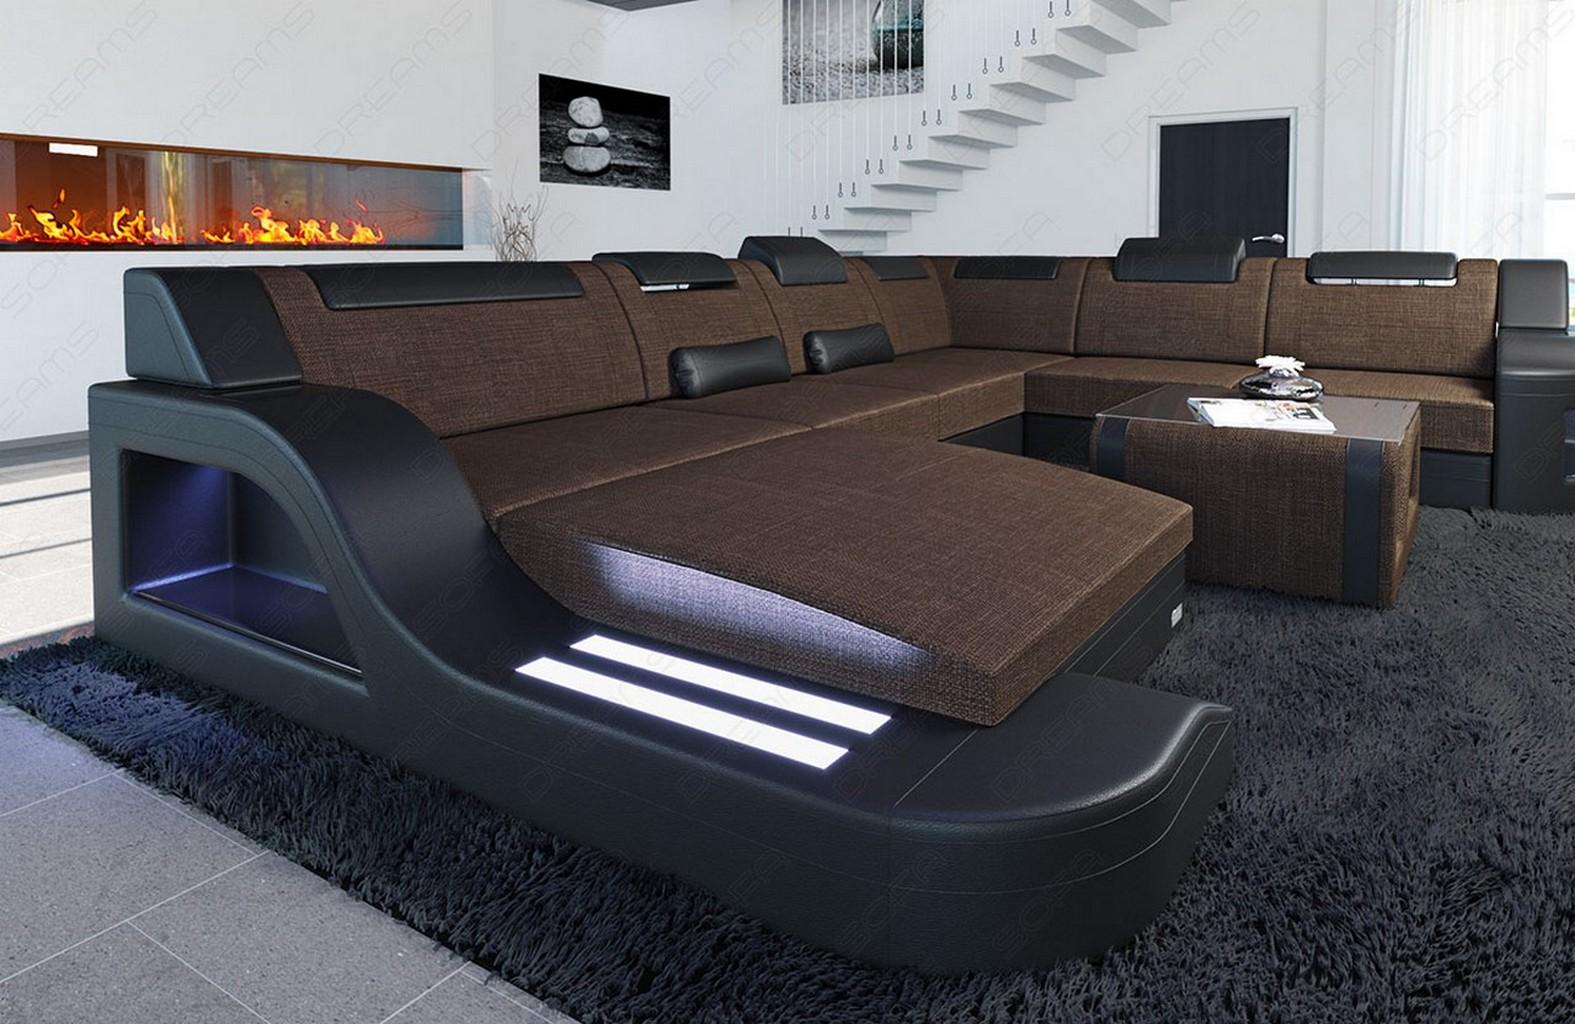 Interior design palermo xxl new look fabric mix with led for Designer wohnlandschaft xxl